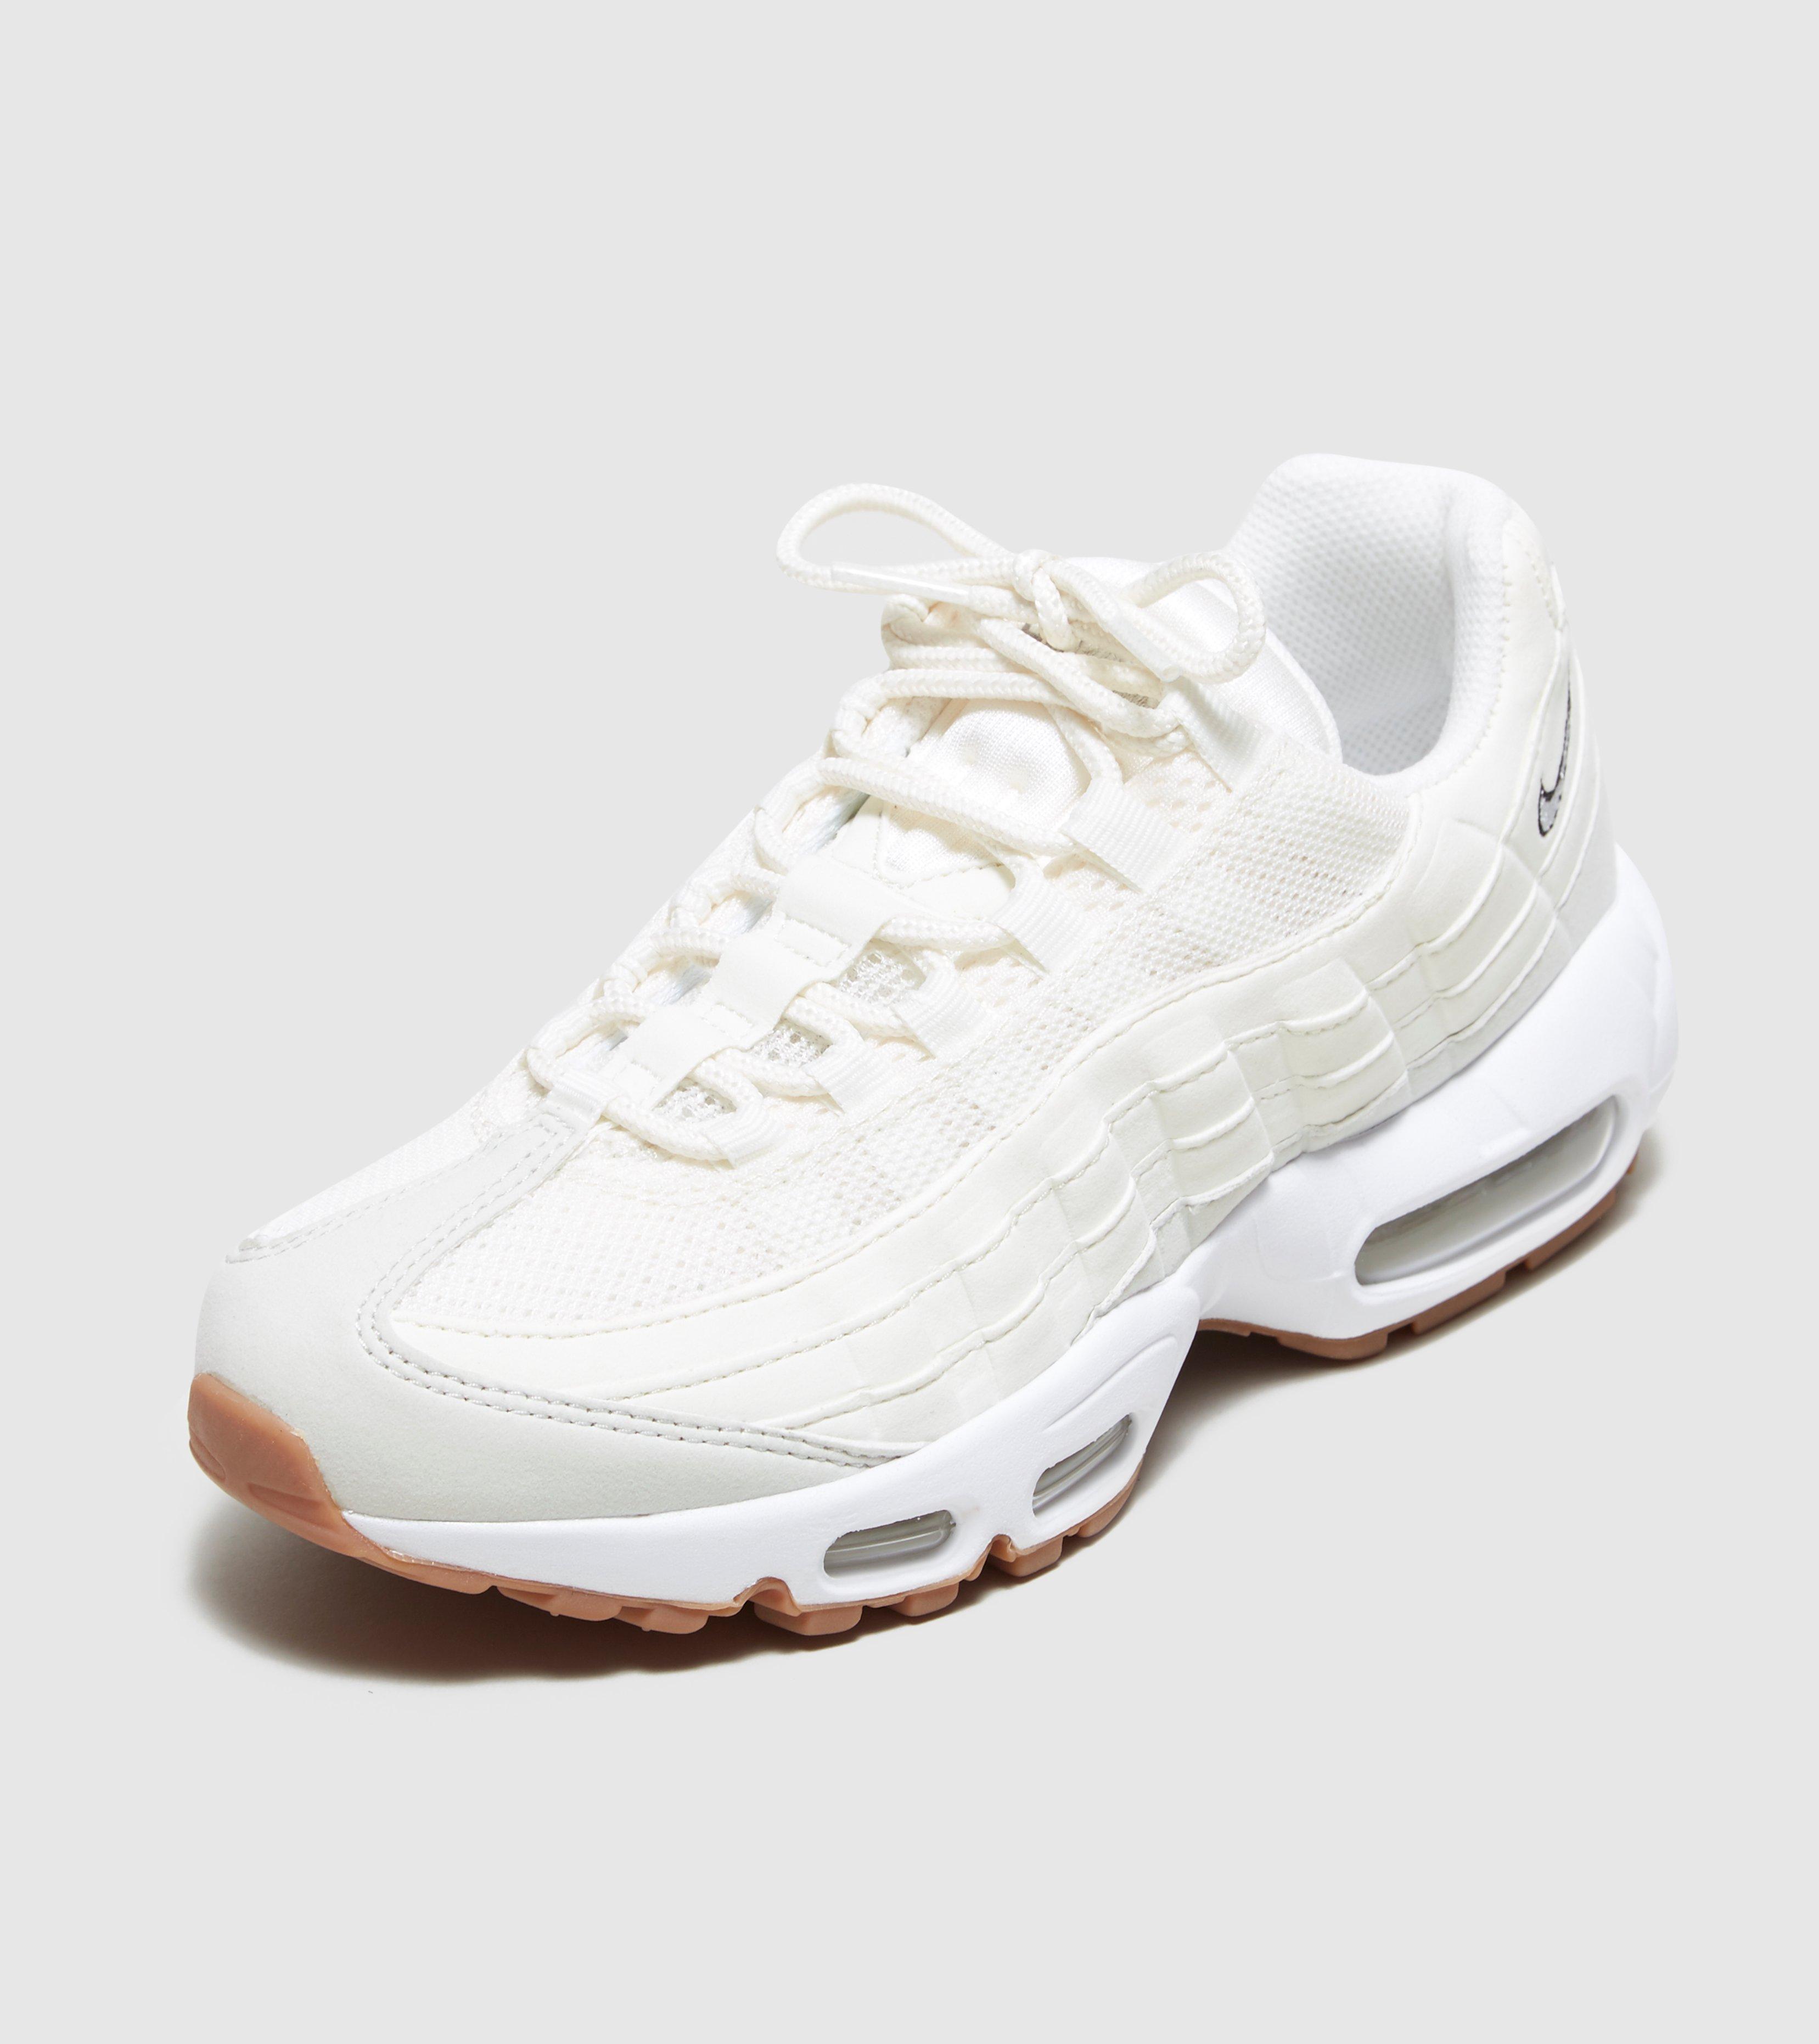 nike air max 95 womens uk shoe size conversion